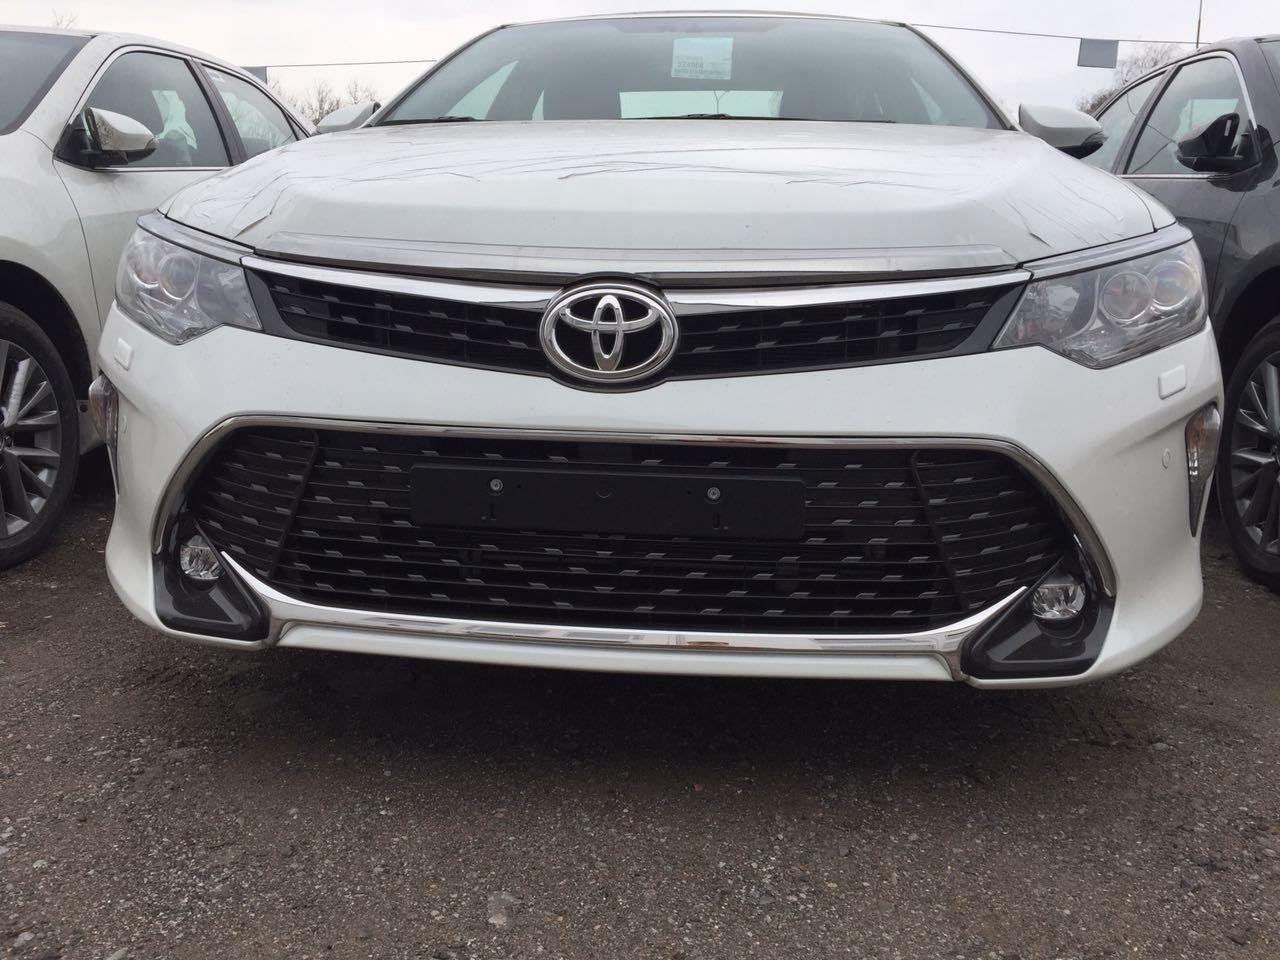 Toyota Camry 2017 2 5 #10